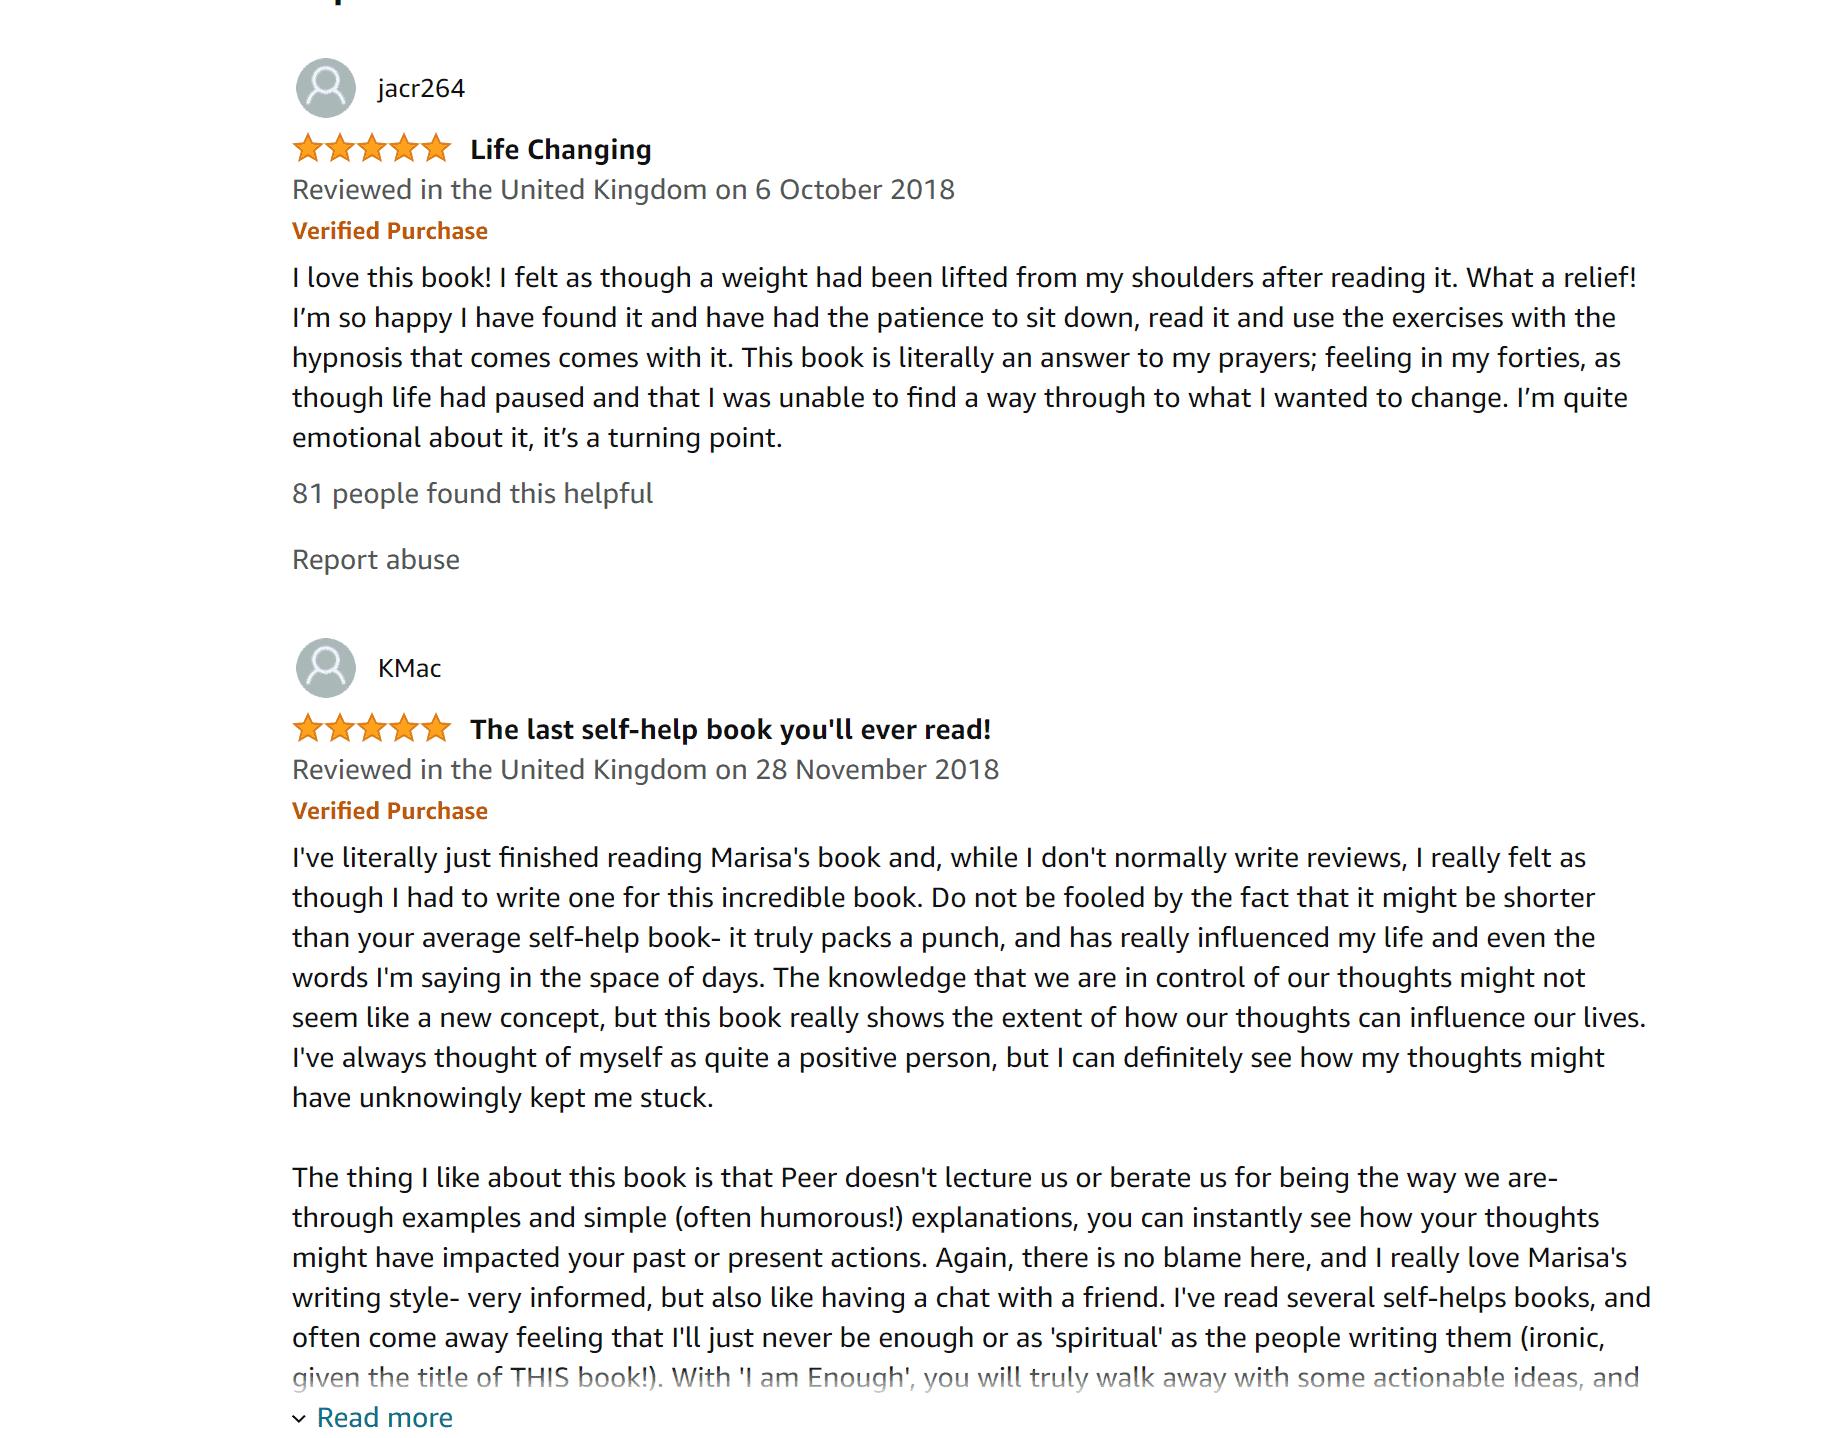 Marisa Peer Amazon Customer Reviews